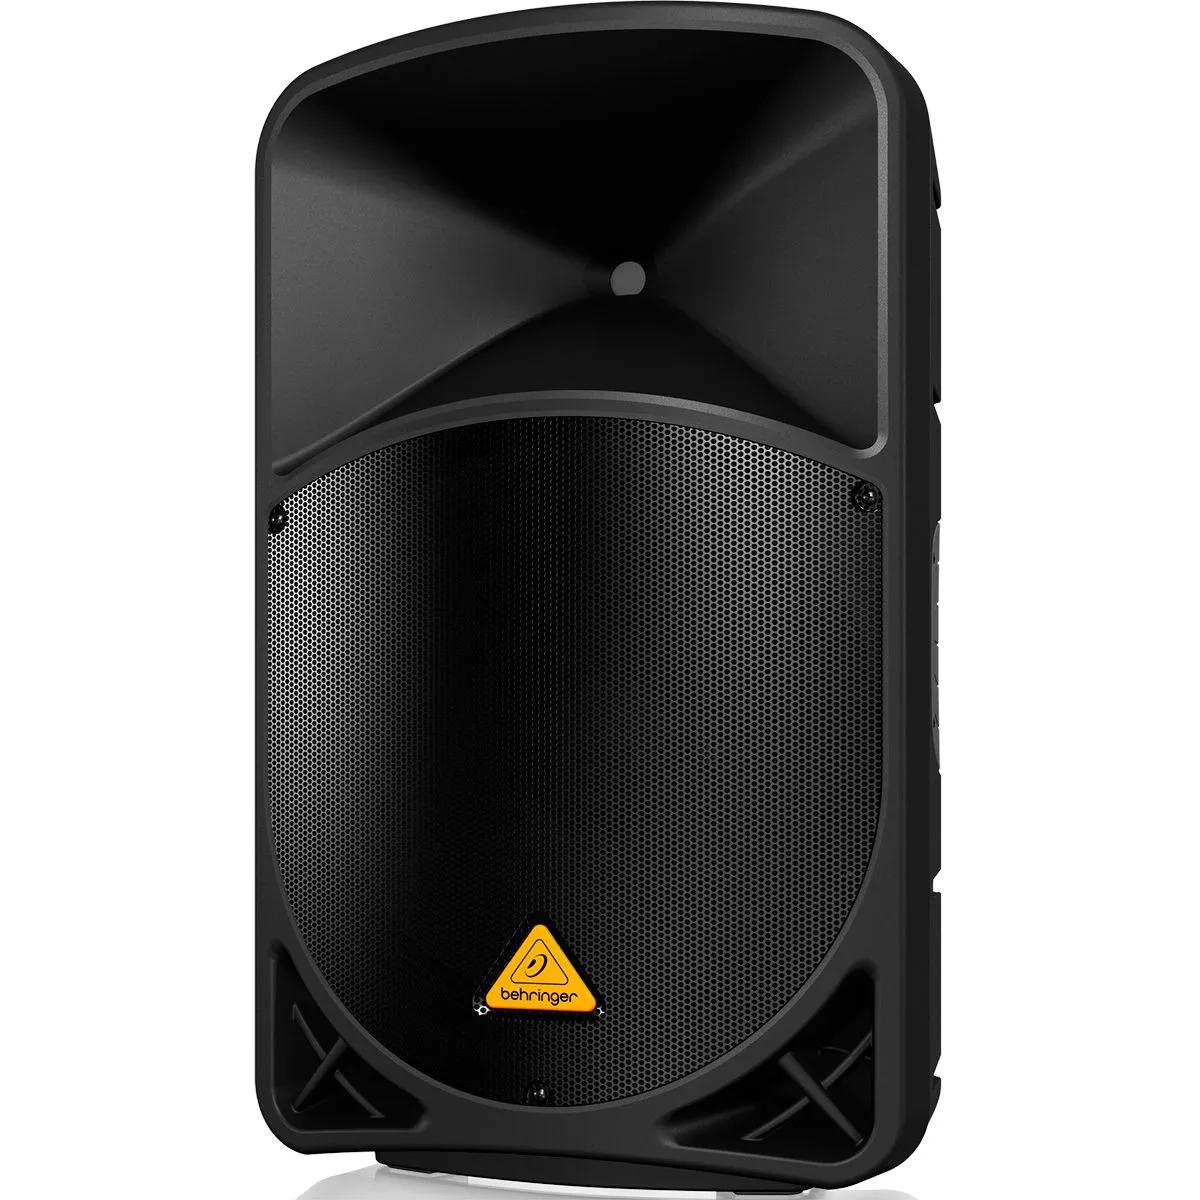 Caixa de Som Ativa Behringer B115MP3 1000W 110V